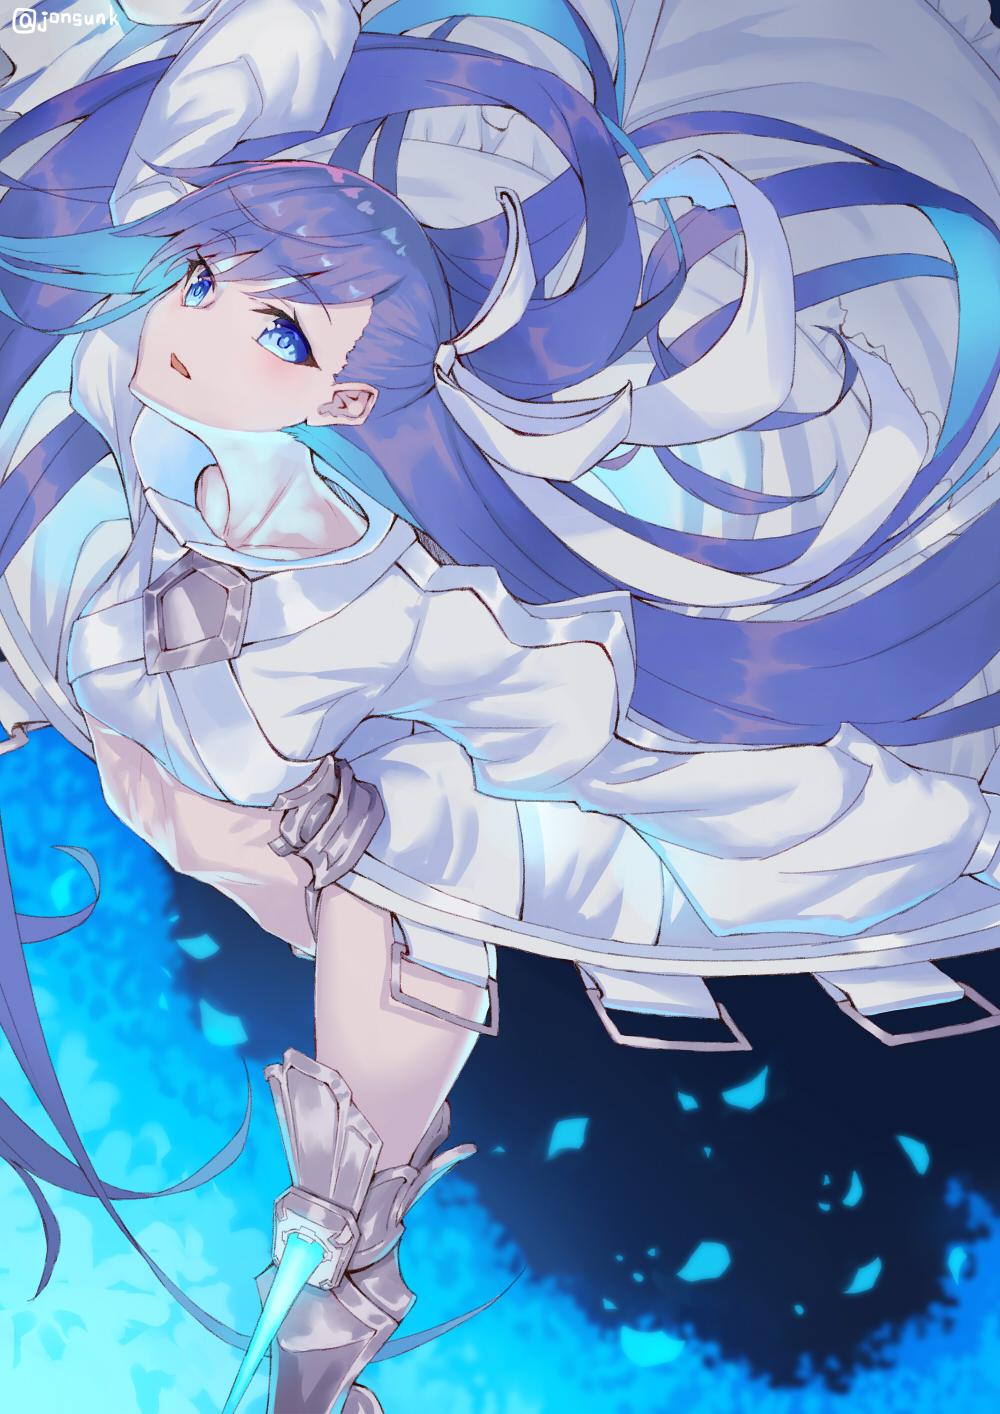 Wallpaper : anime girls, Fate Grand Order, Meltlilith